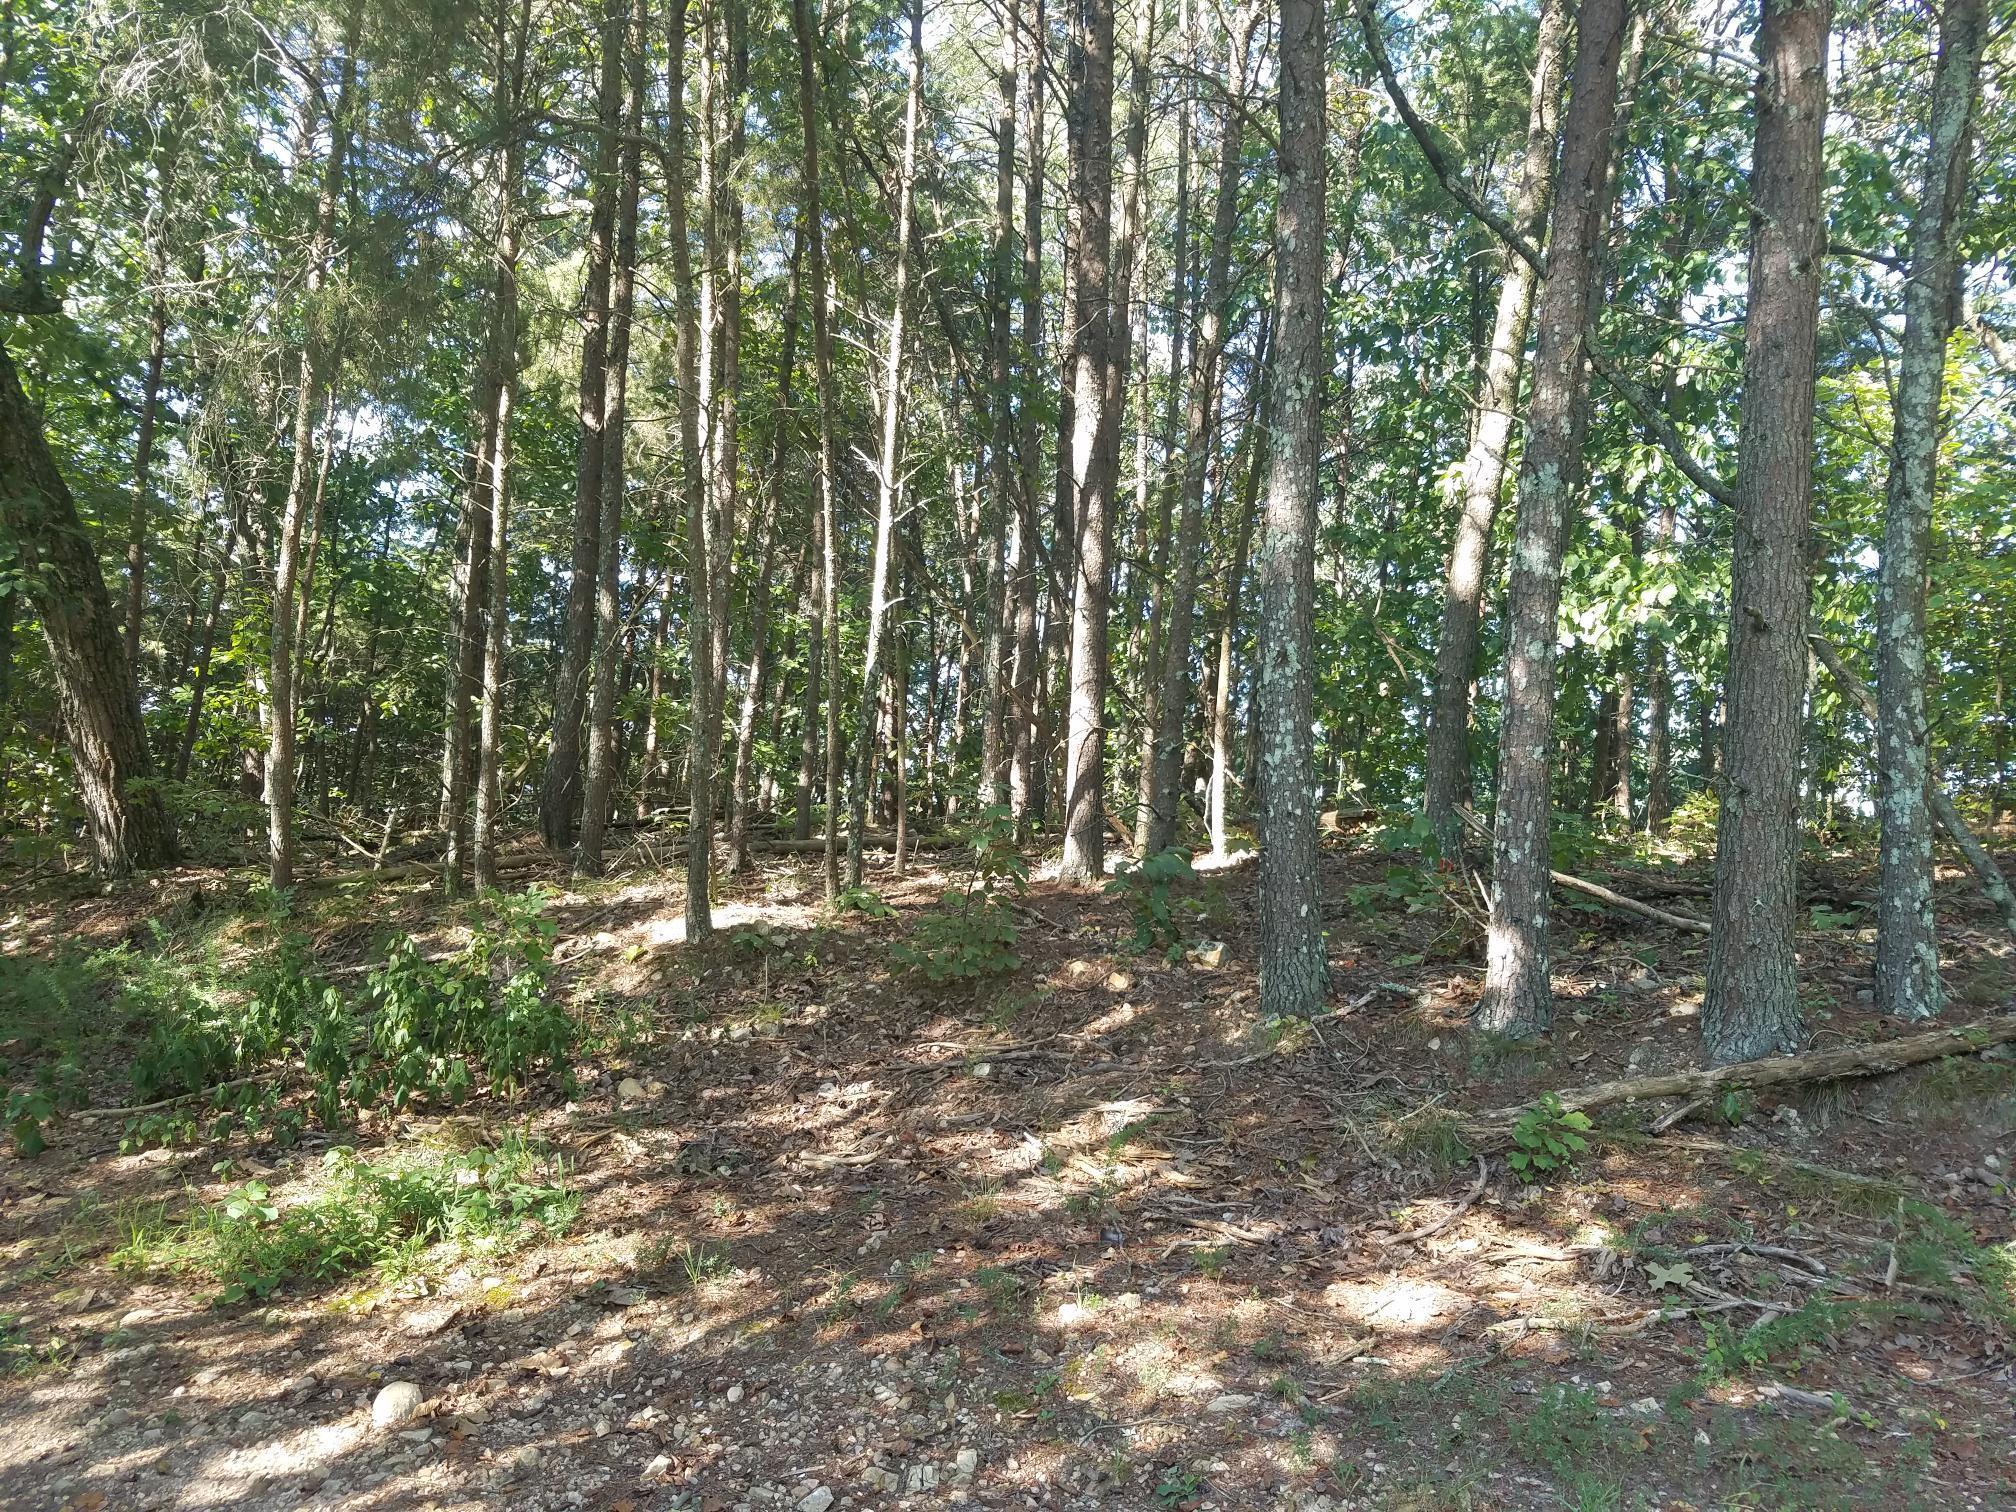 0 Arthur Ct, Waverly, TN 37185 - Waverly, TN real estate listing